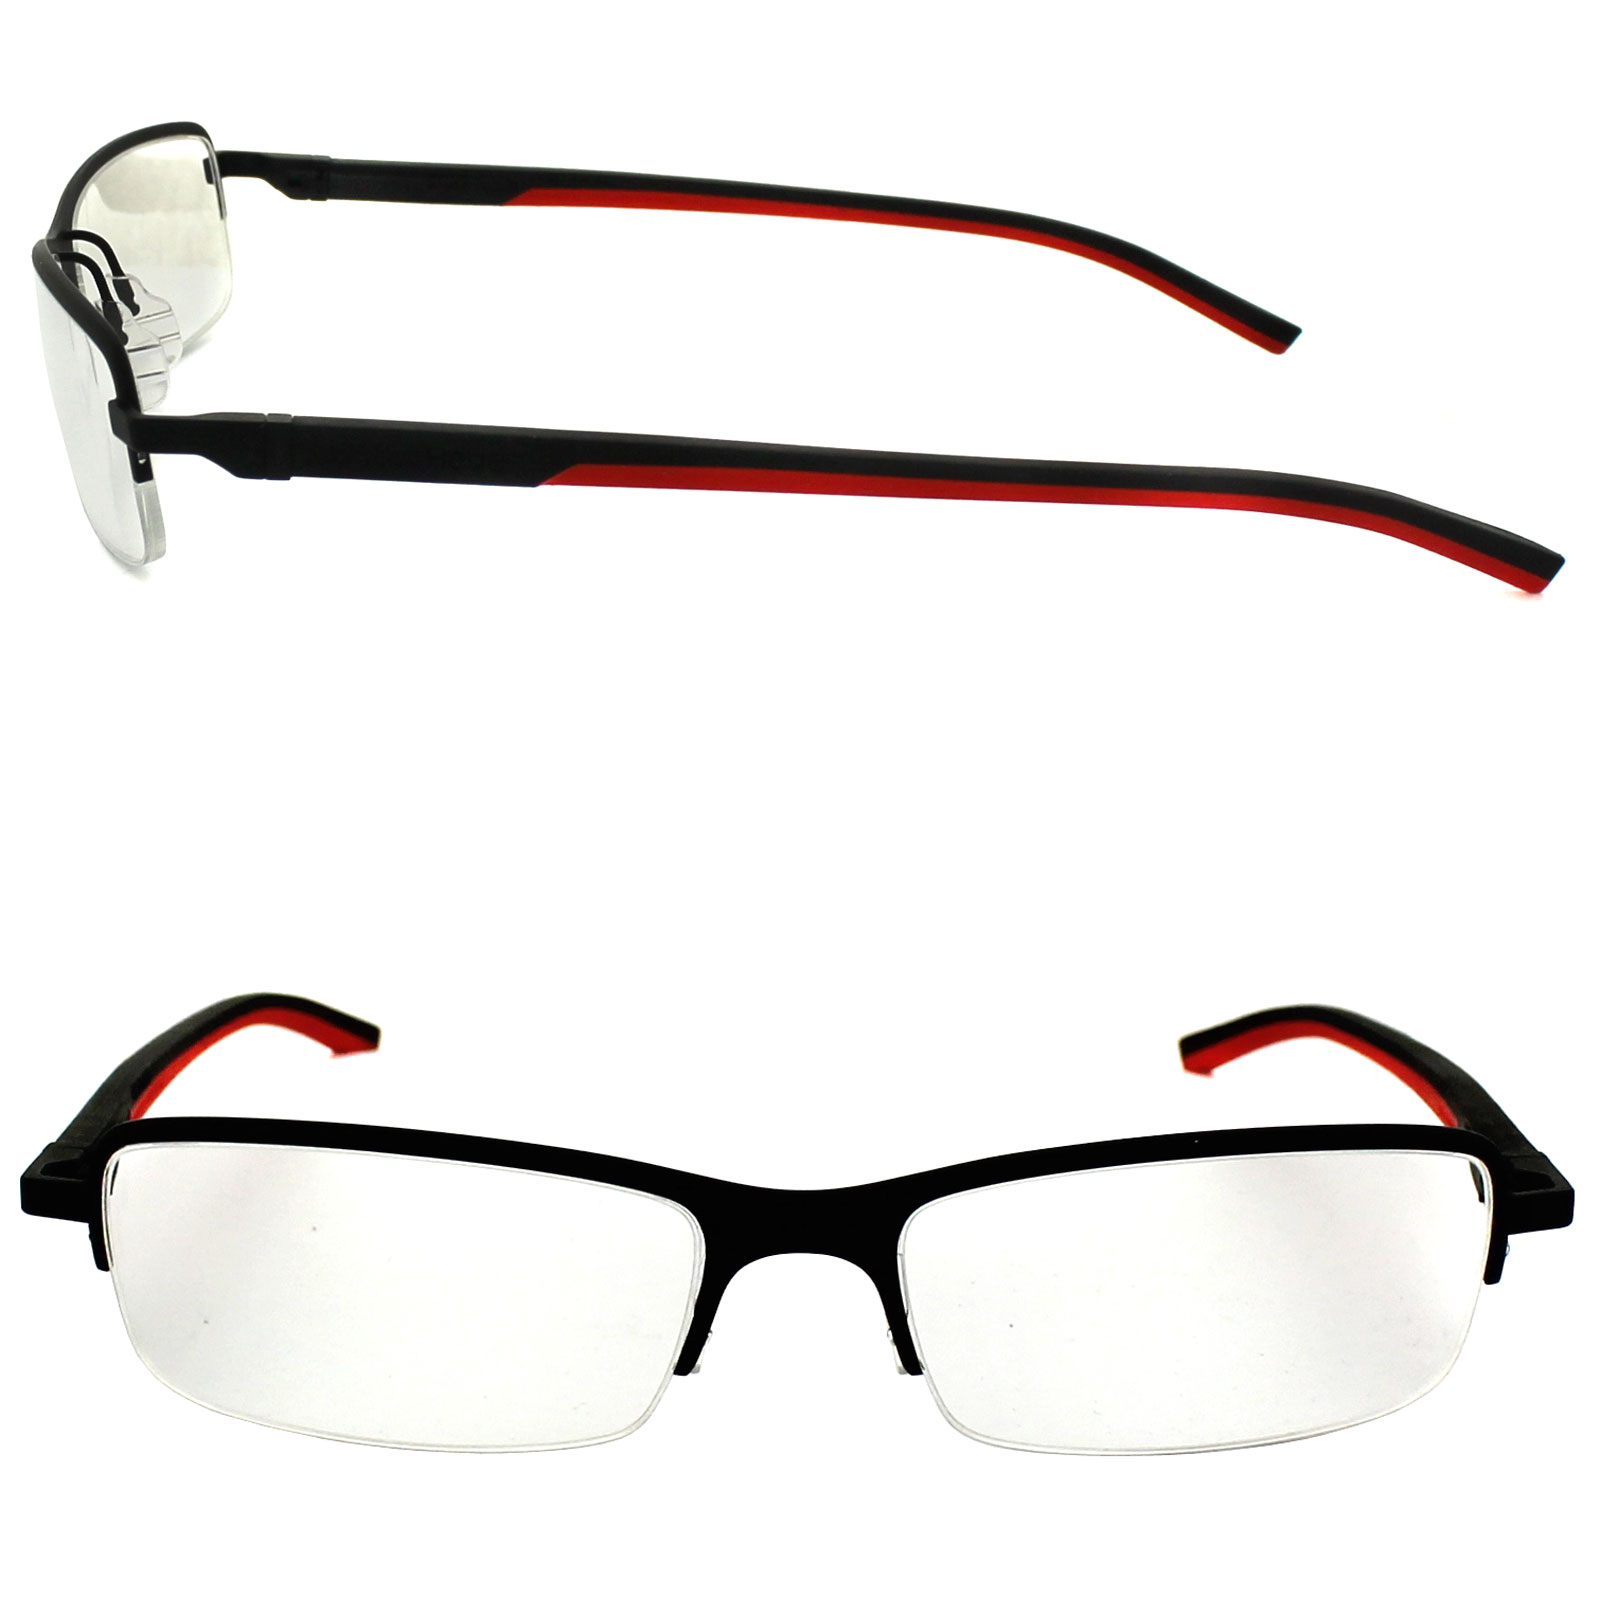 Tag heuer eyeglasses frames uk -  Tag Heuer Glasses Frames Automatic 0824 012 Matt Black Red Thumbnail 2